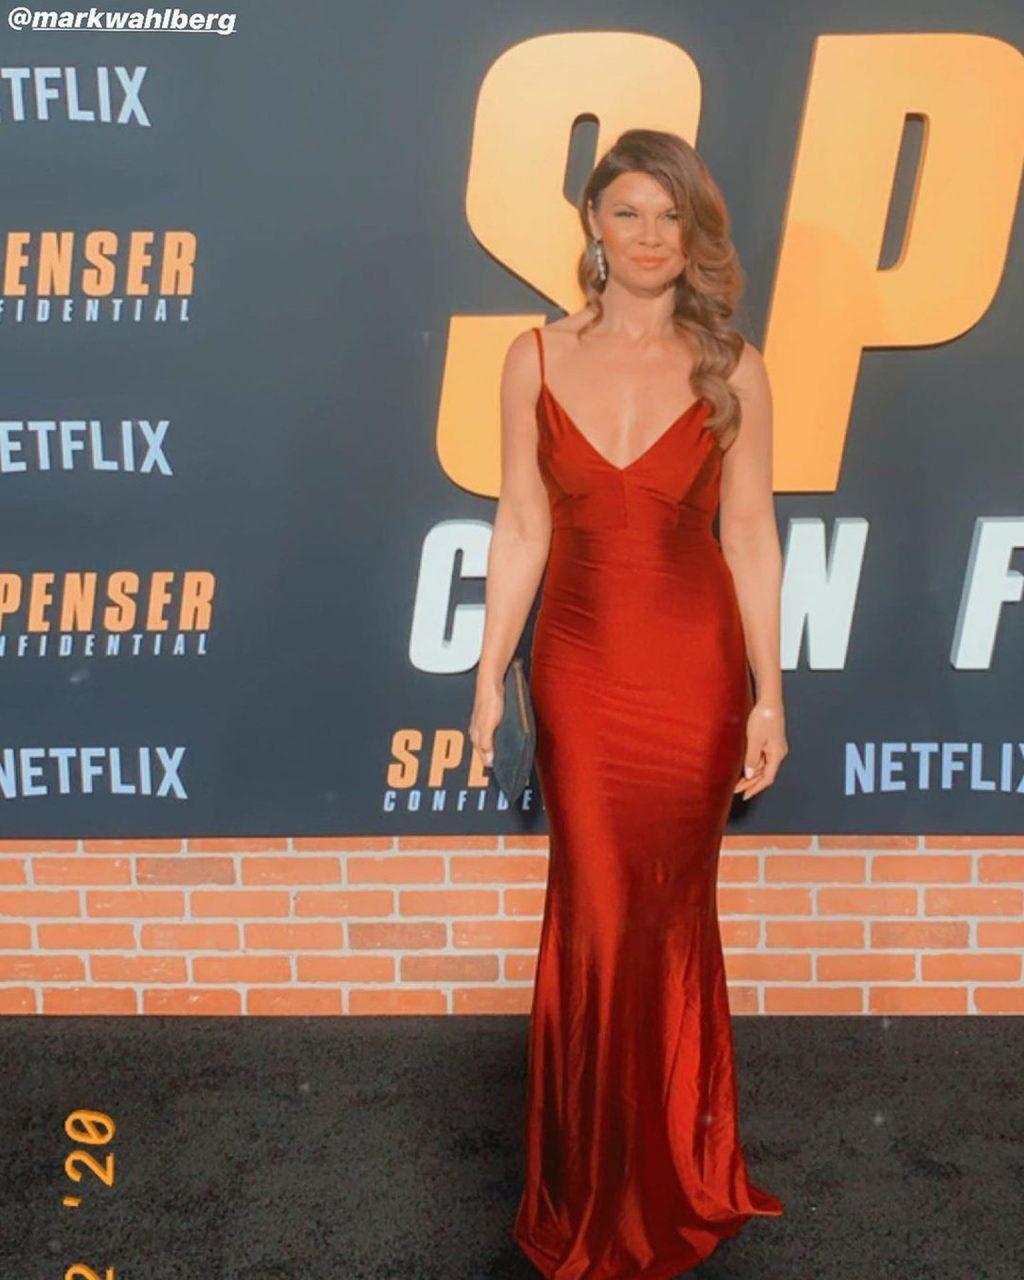 Danielle Vasinova Shows Her Pokies at the Premiere of Netflix's Spenser Confidential (5 Photos)